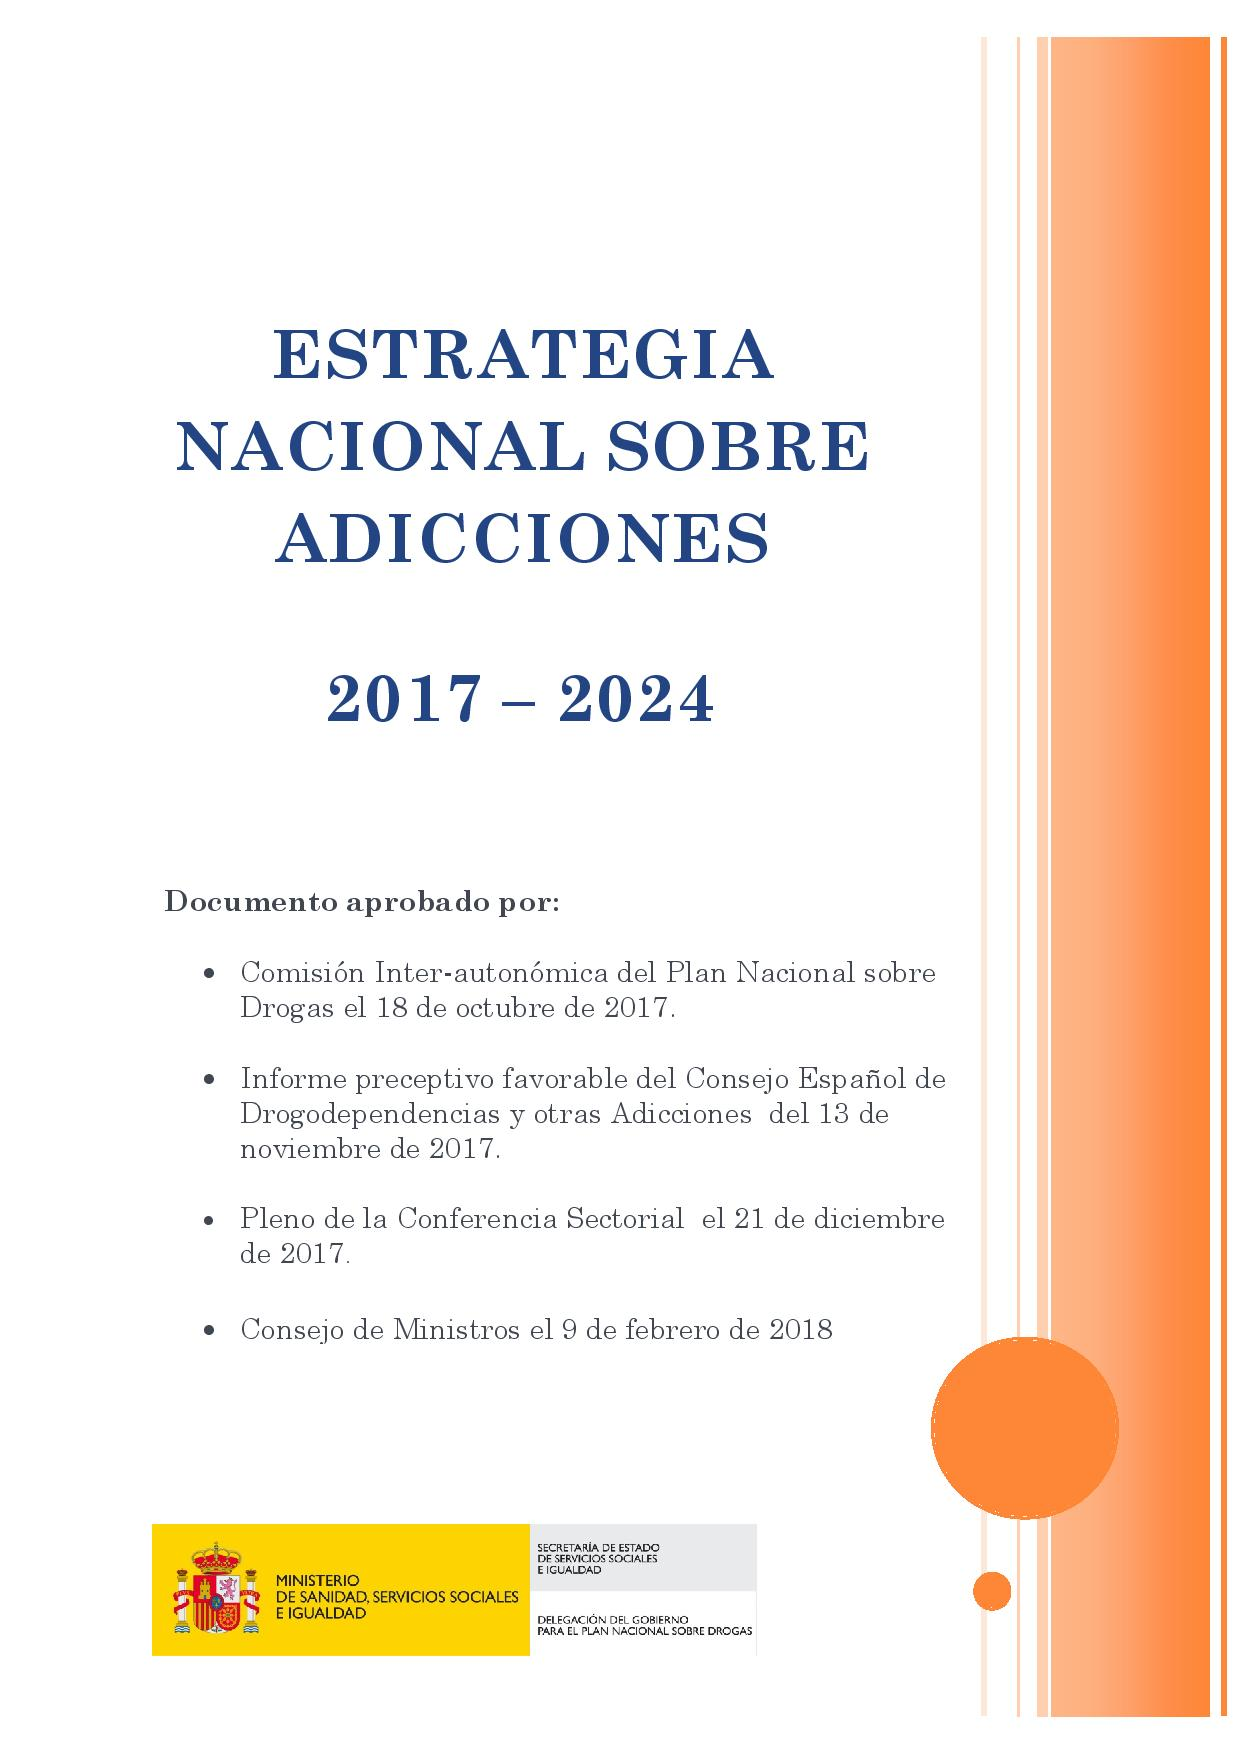 ESTRATEGIA NACIONAL SOBRE ADICCIONES  2017 – 2024